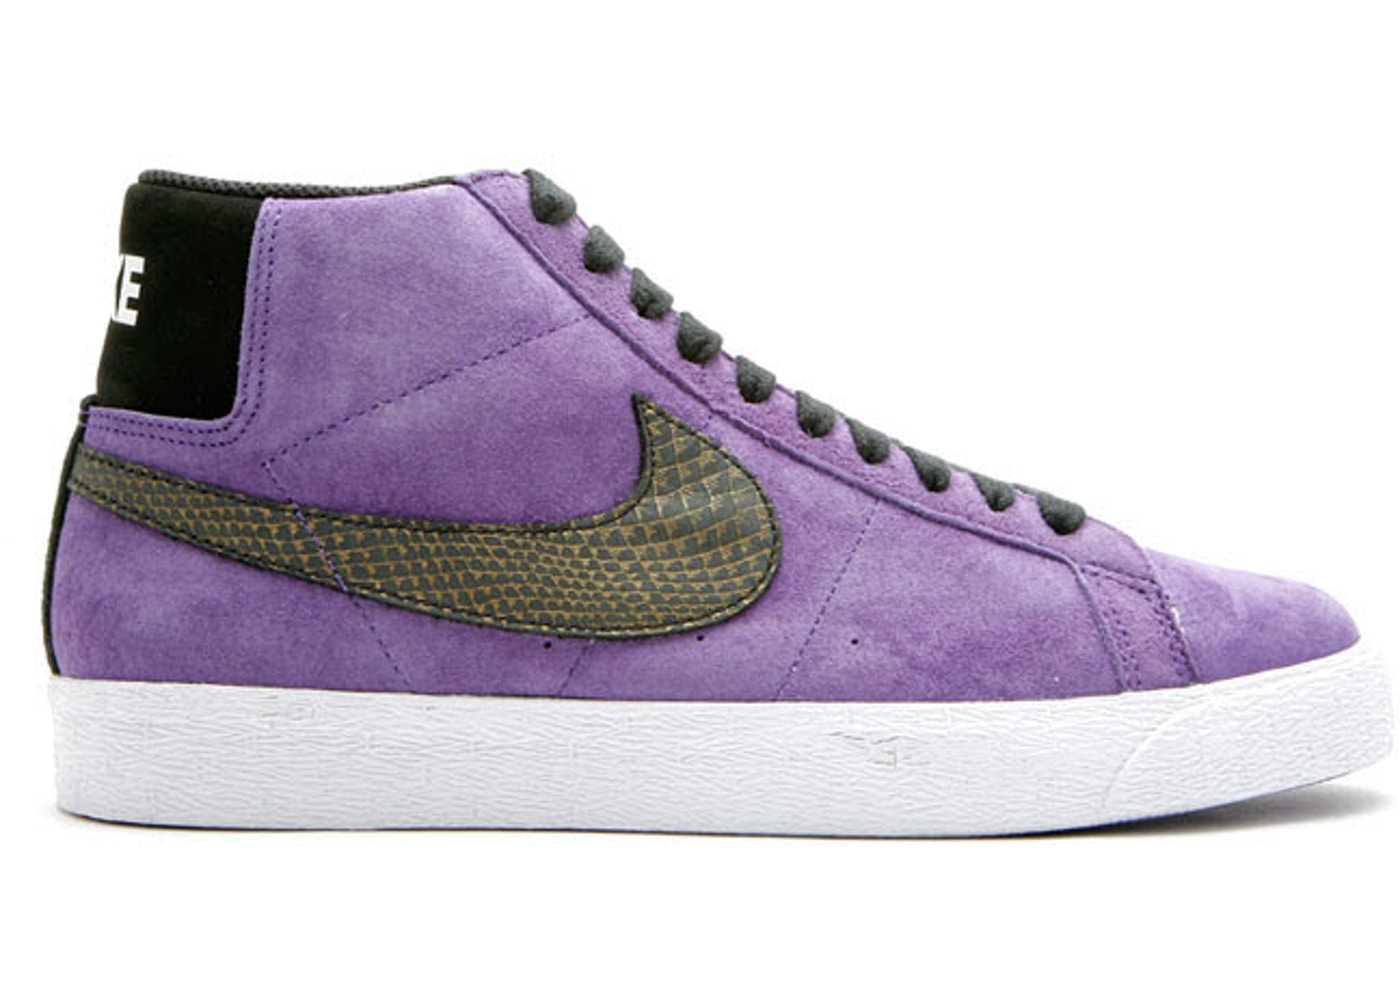 newest collection 2b0ec c12f0 Nike SB Blazer Varsity Purple - 314070-501